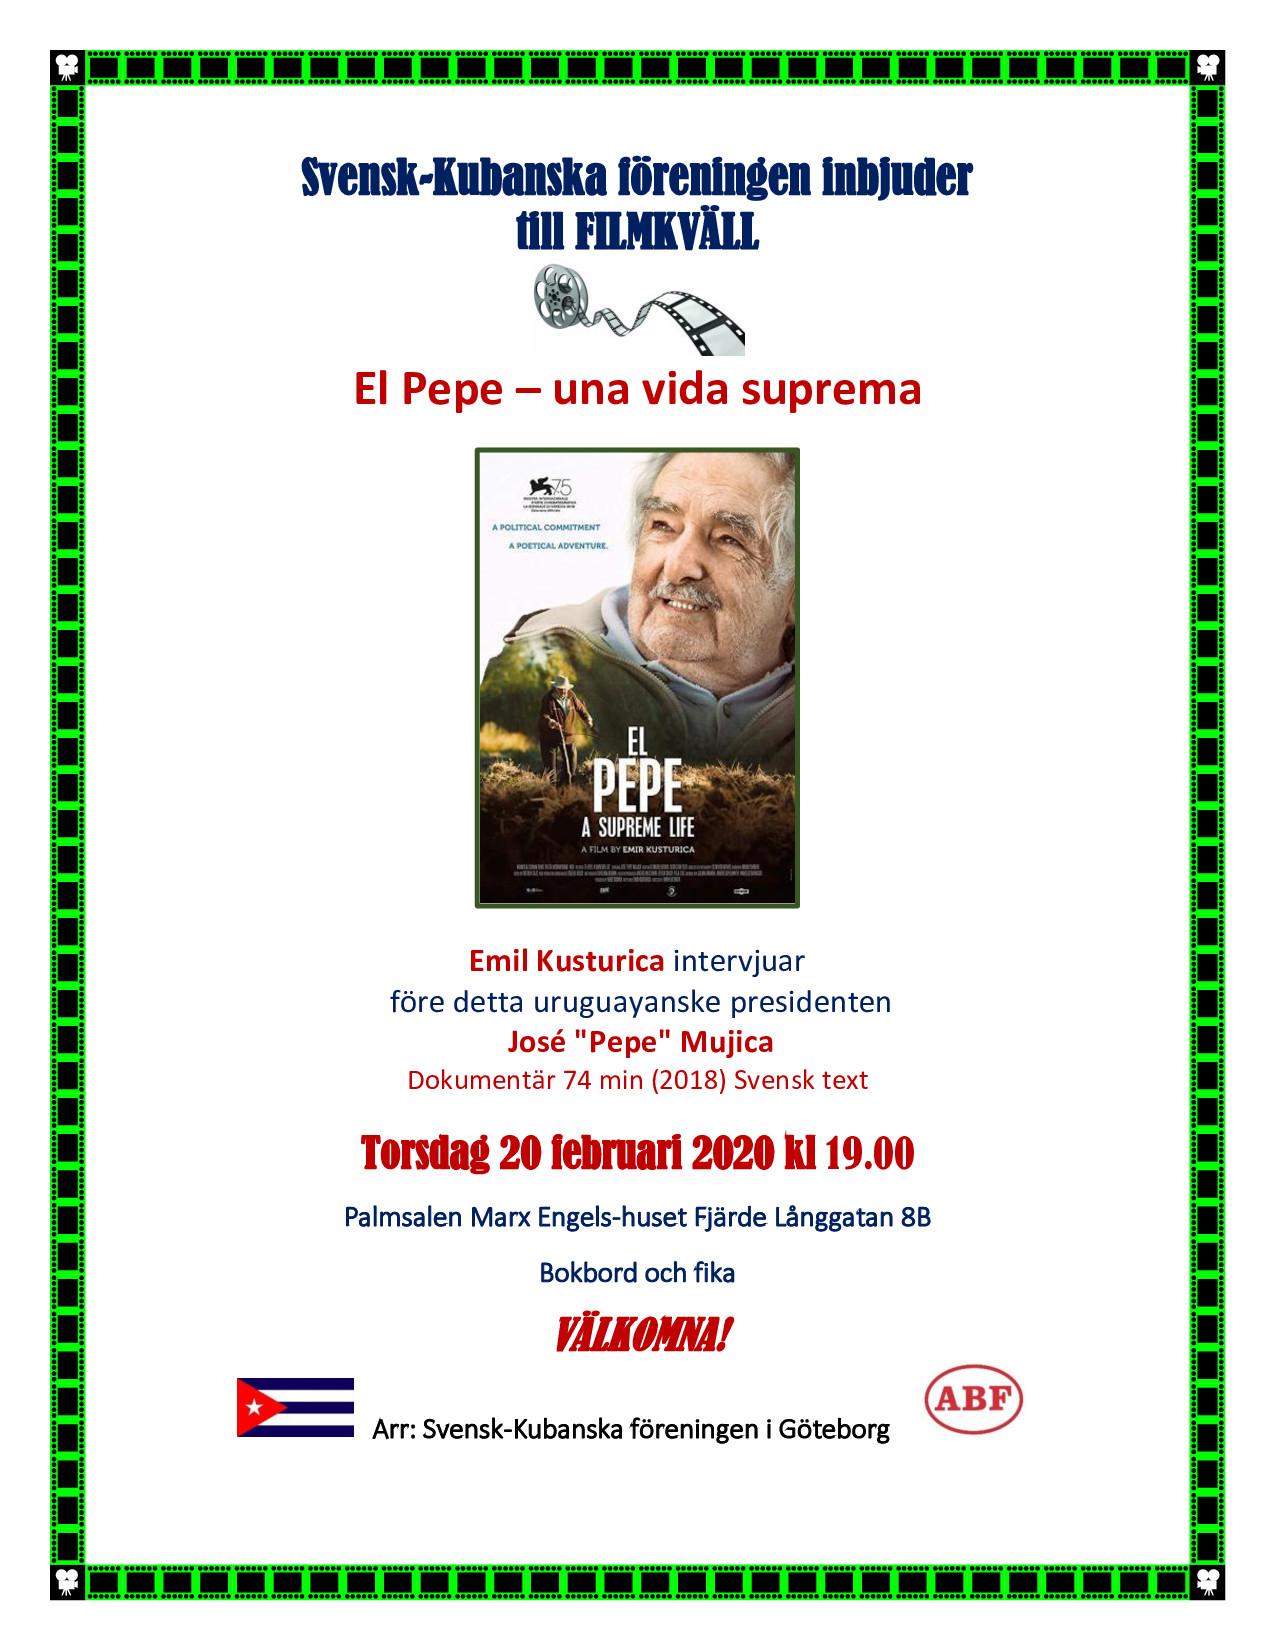 Gbg_Filmkväll 20 feb 2020_p001